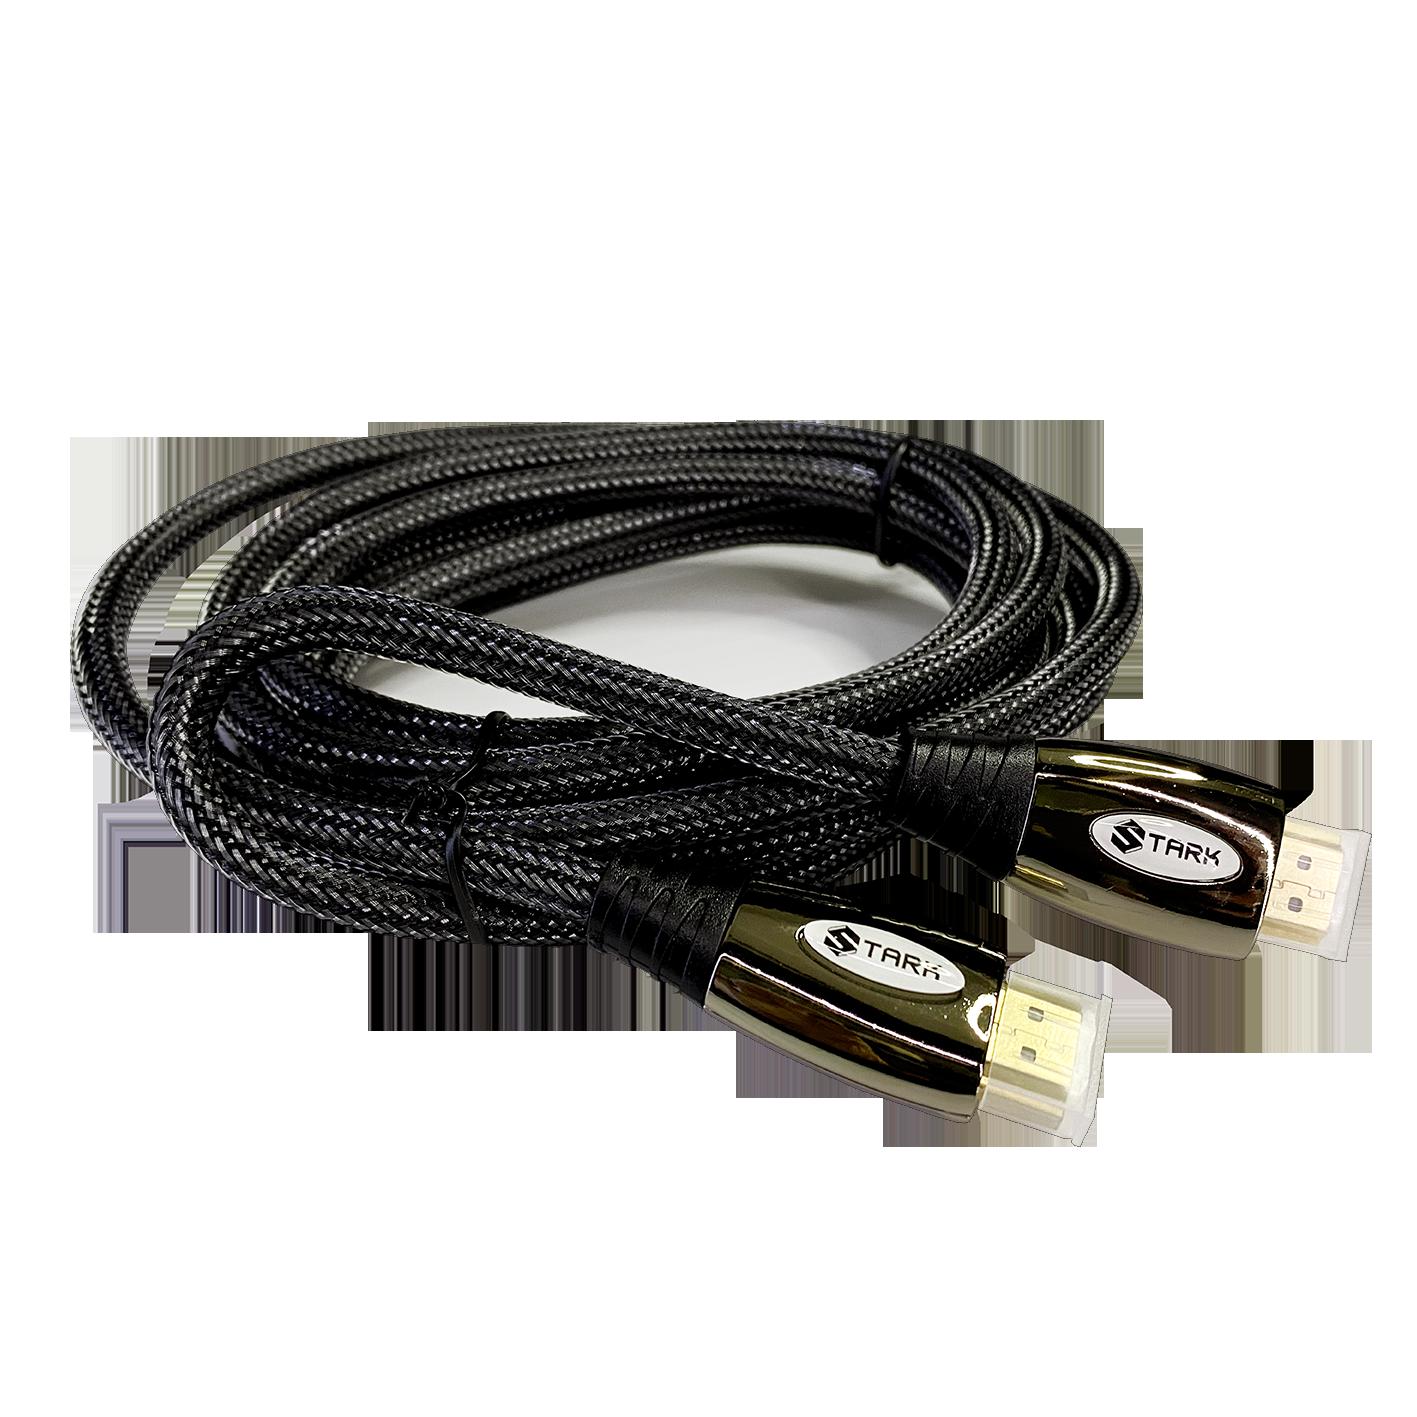 STARK kabl HDMI M-M, pozlaćen 4K(Ultra HD), metalno kućište, podržava 3D, 2m (Slika 2)